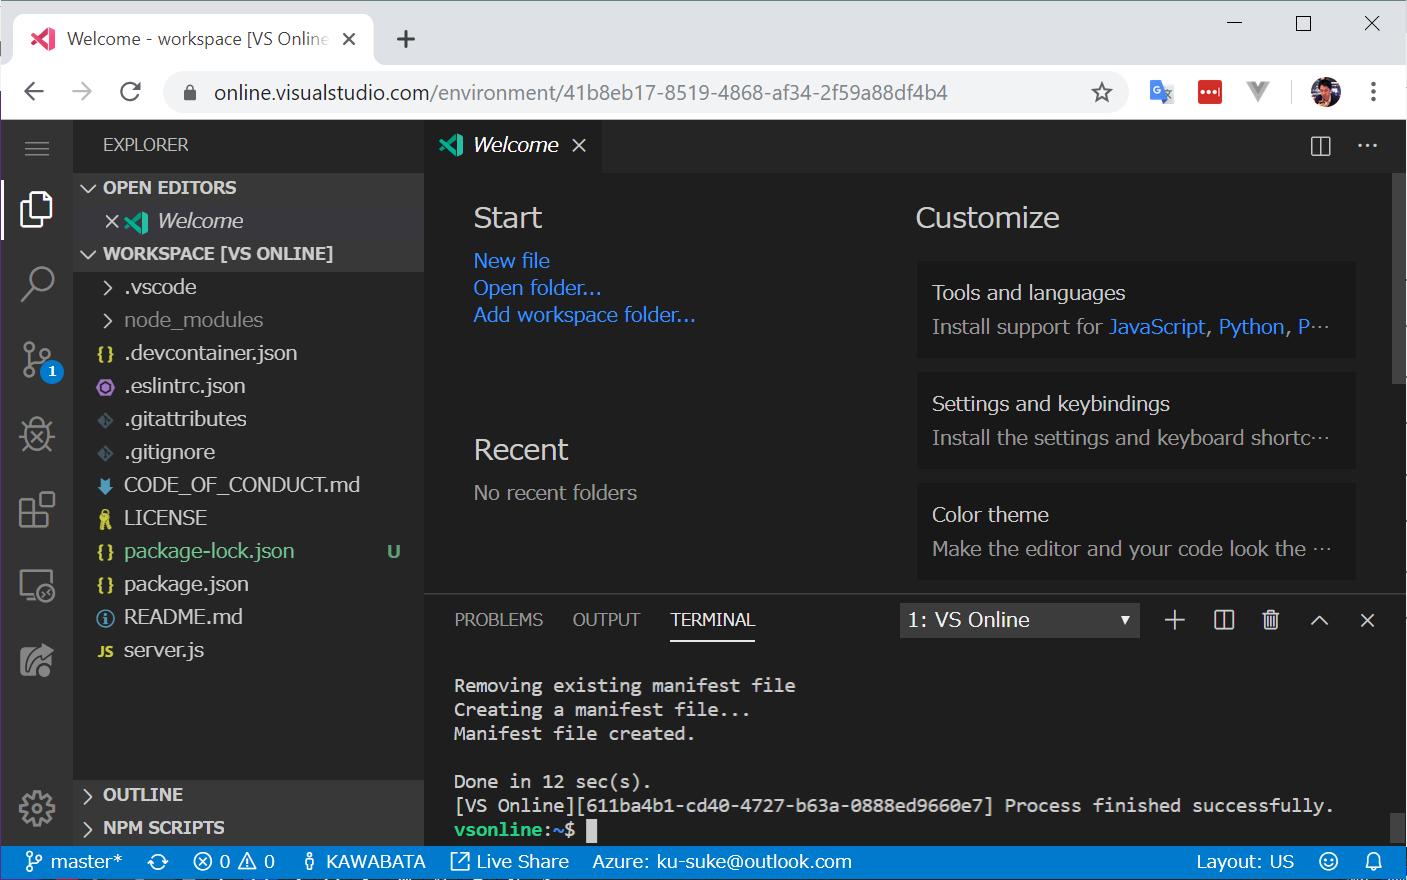 Welcome - workspace [VS Online] - Visual Studio Code - Insiders - vsonline+41b8eb17-8519-4868-af34-2f59a88df4b4 - Google Chrome 2019-11-05 10.07.25.png